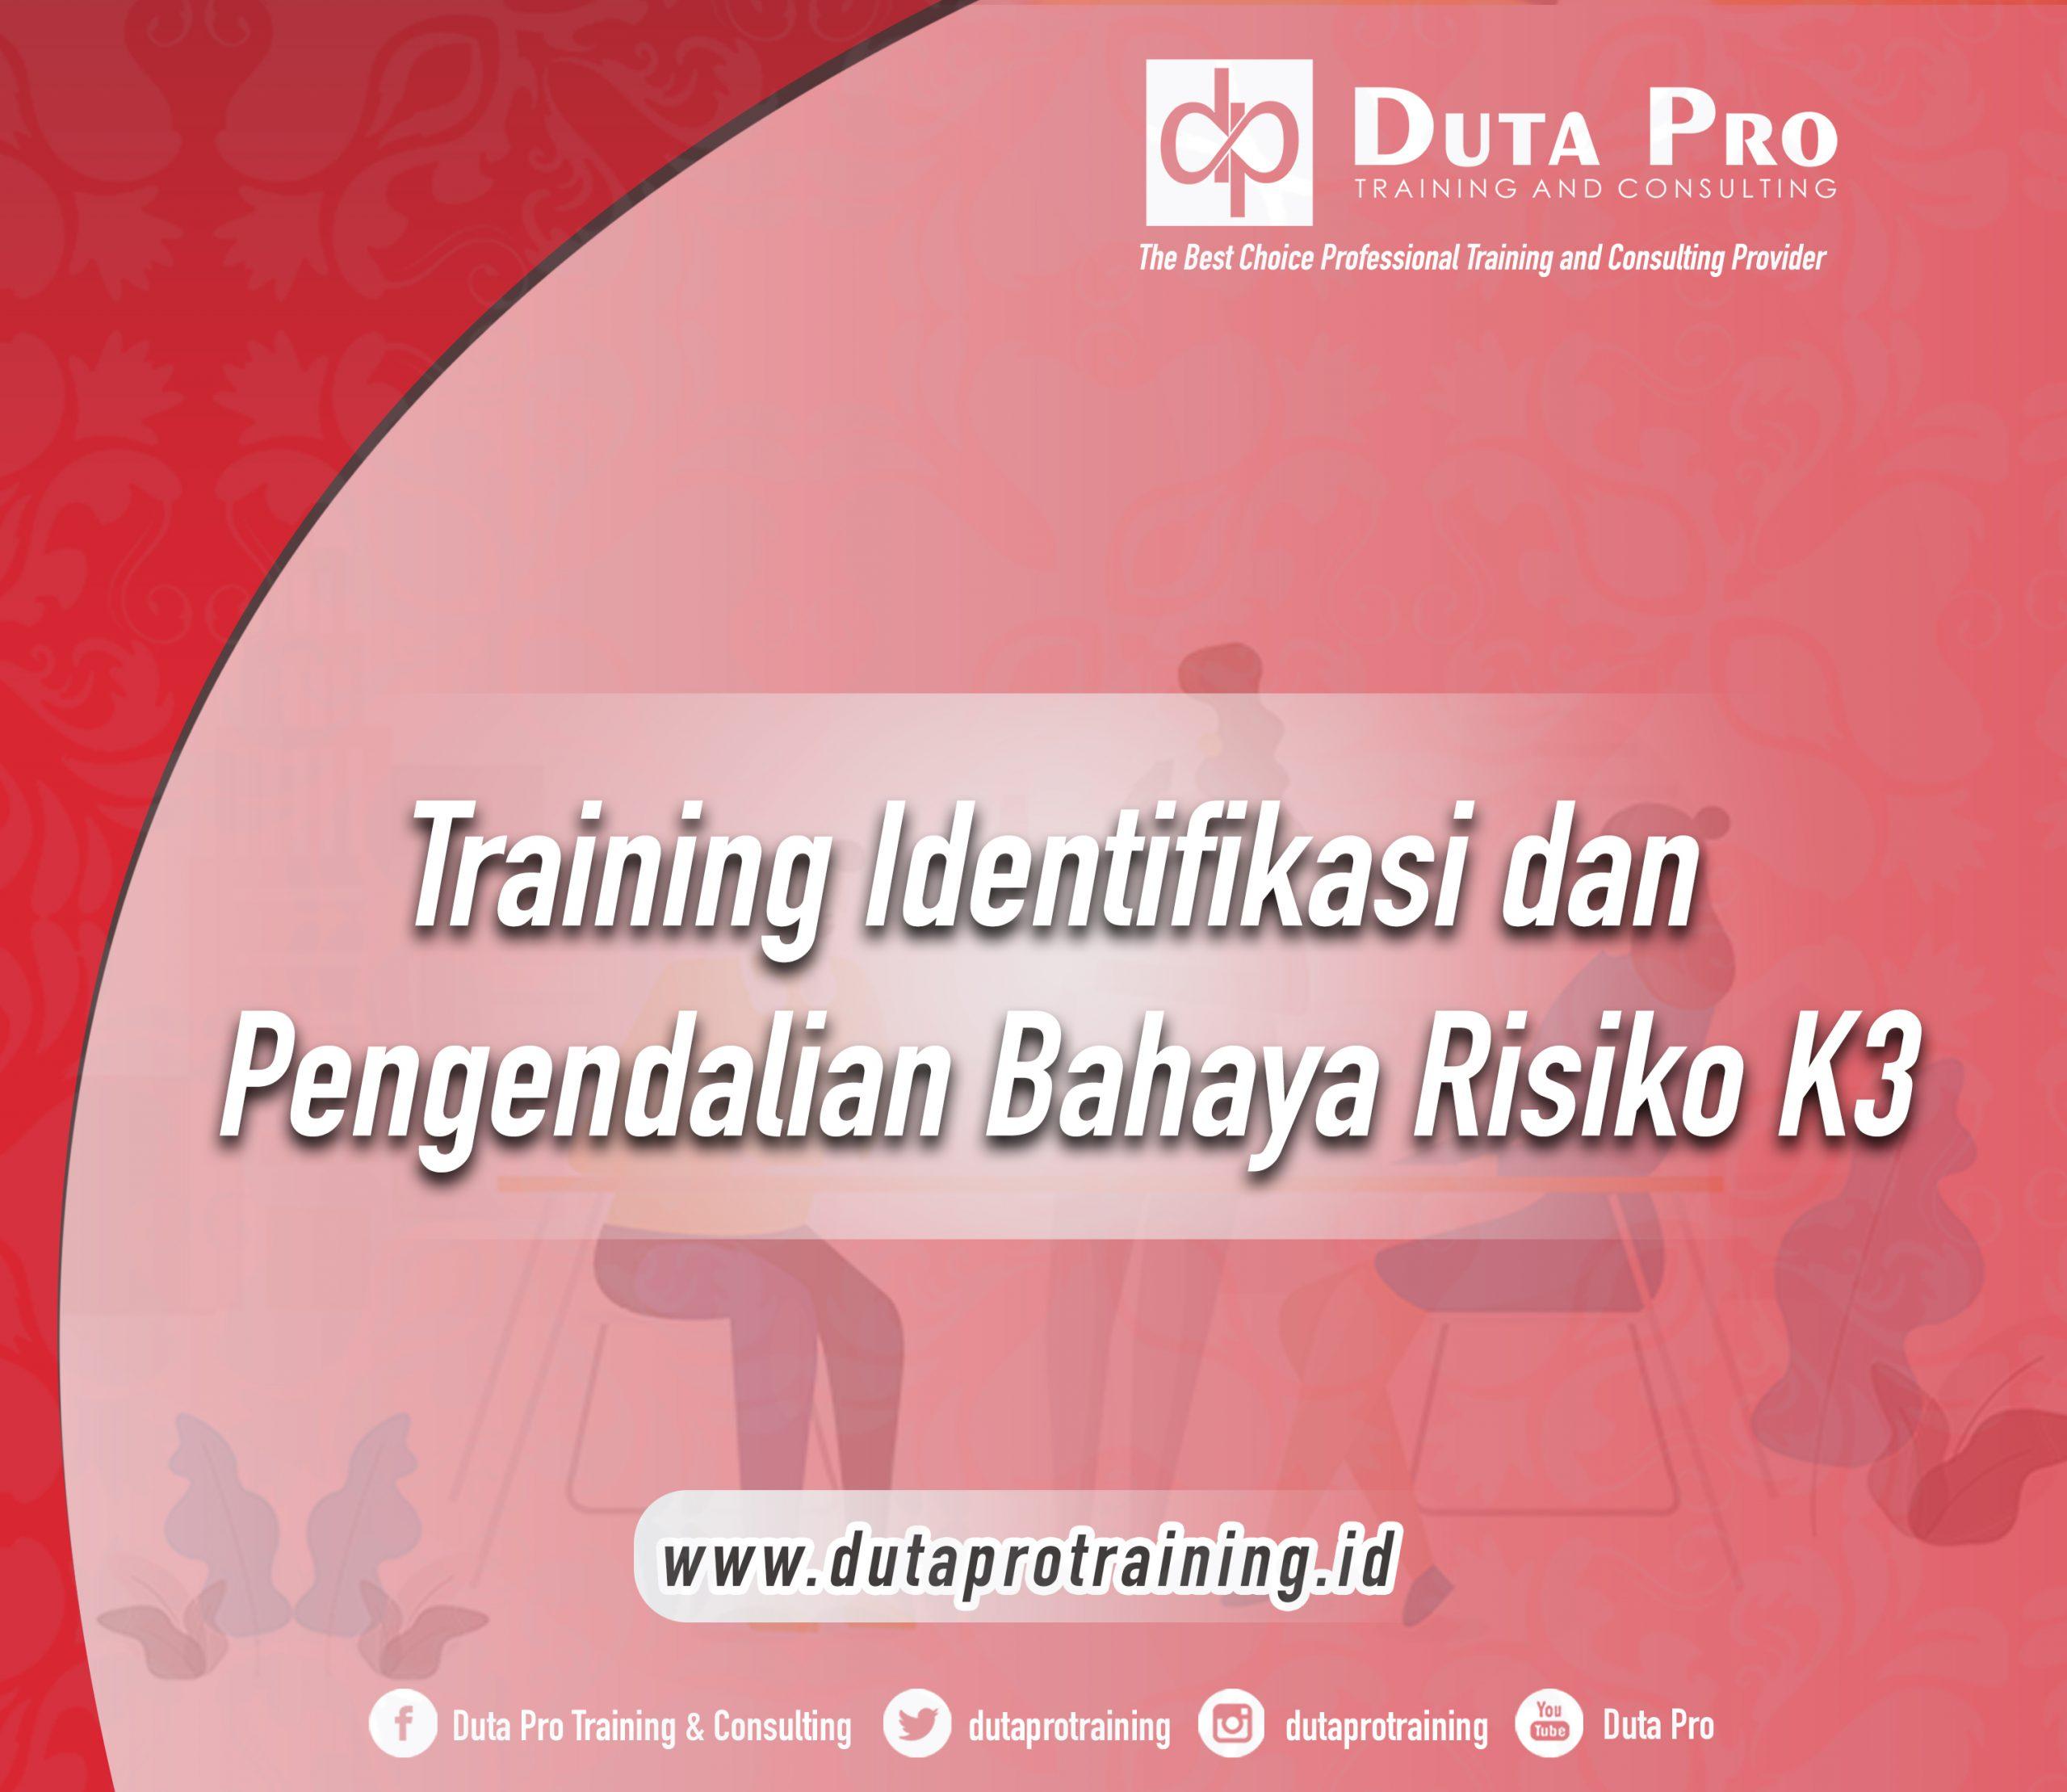 Training Identifikasi dan Pengendalian Bahaya & Risiko K3